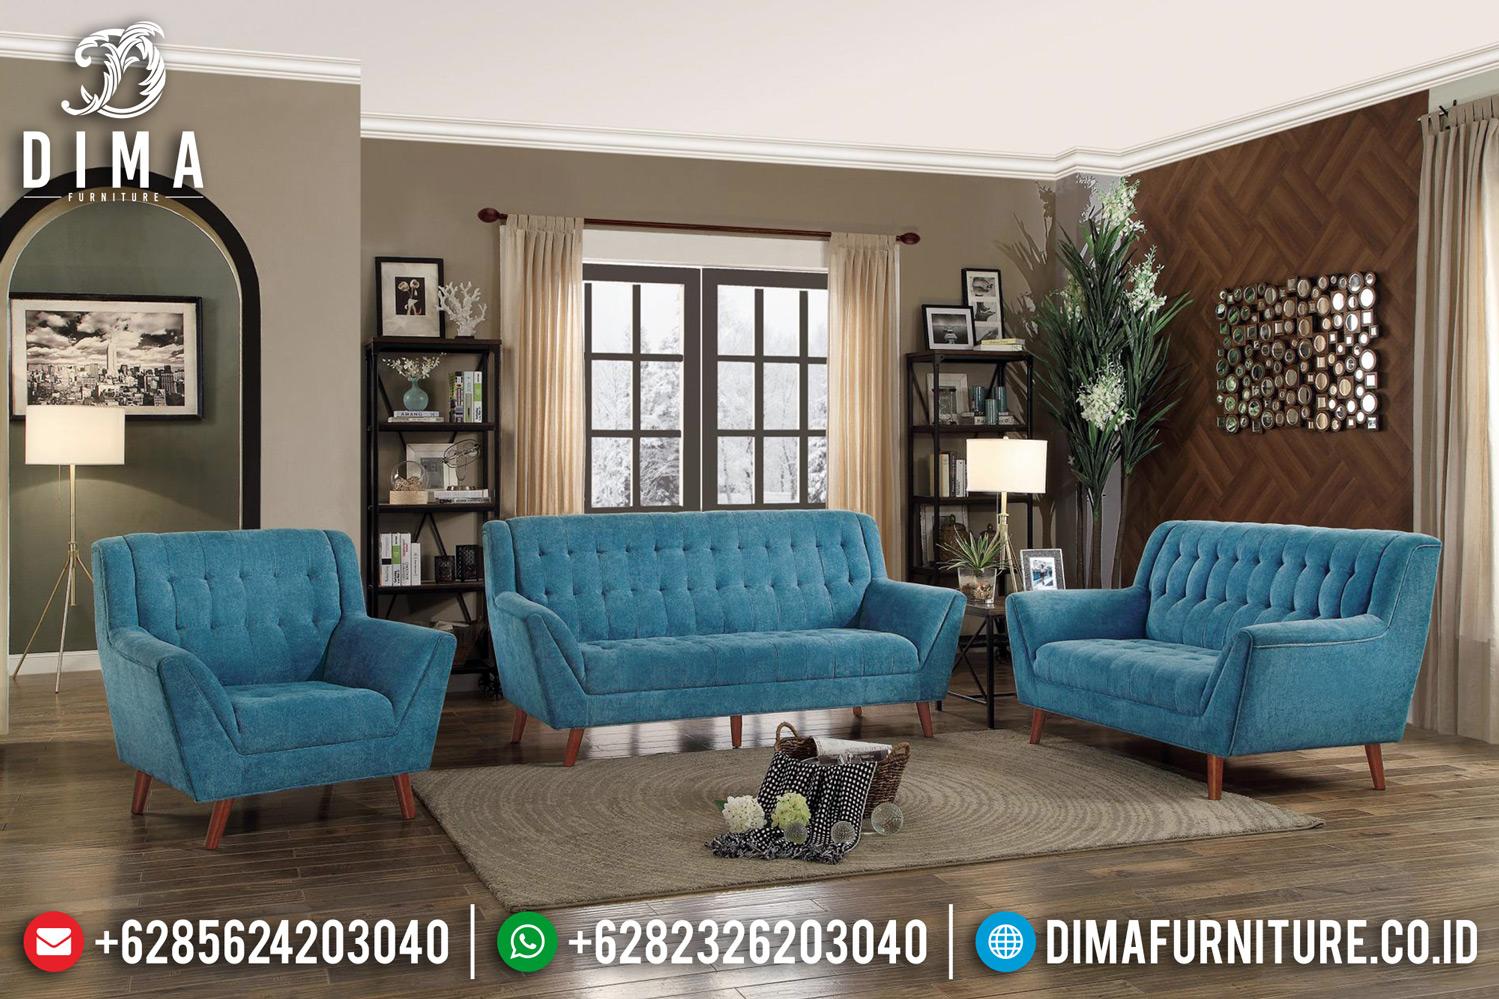 New Sofa Tamu Minimalis Jepara Design Interior Modern BT-0433